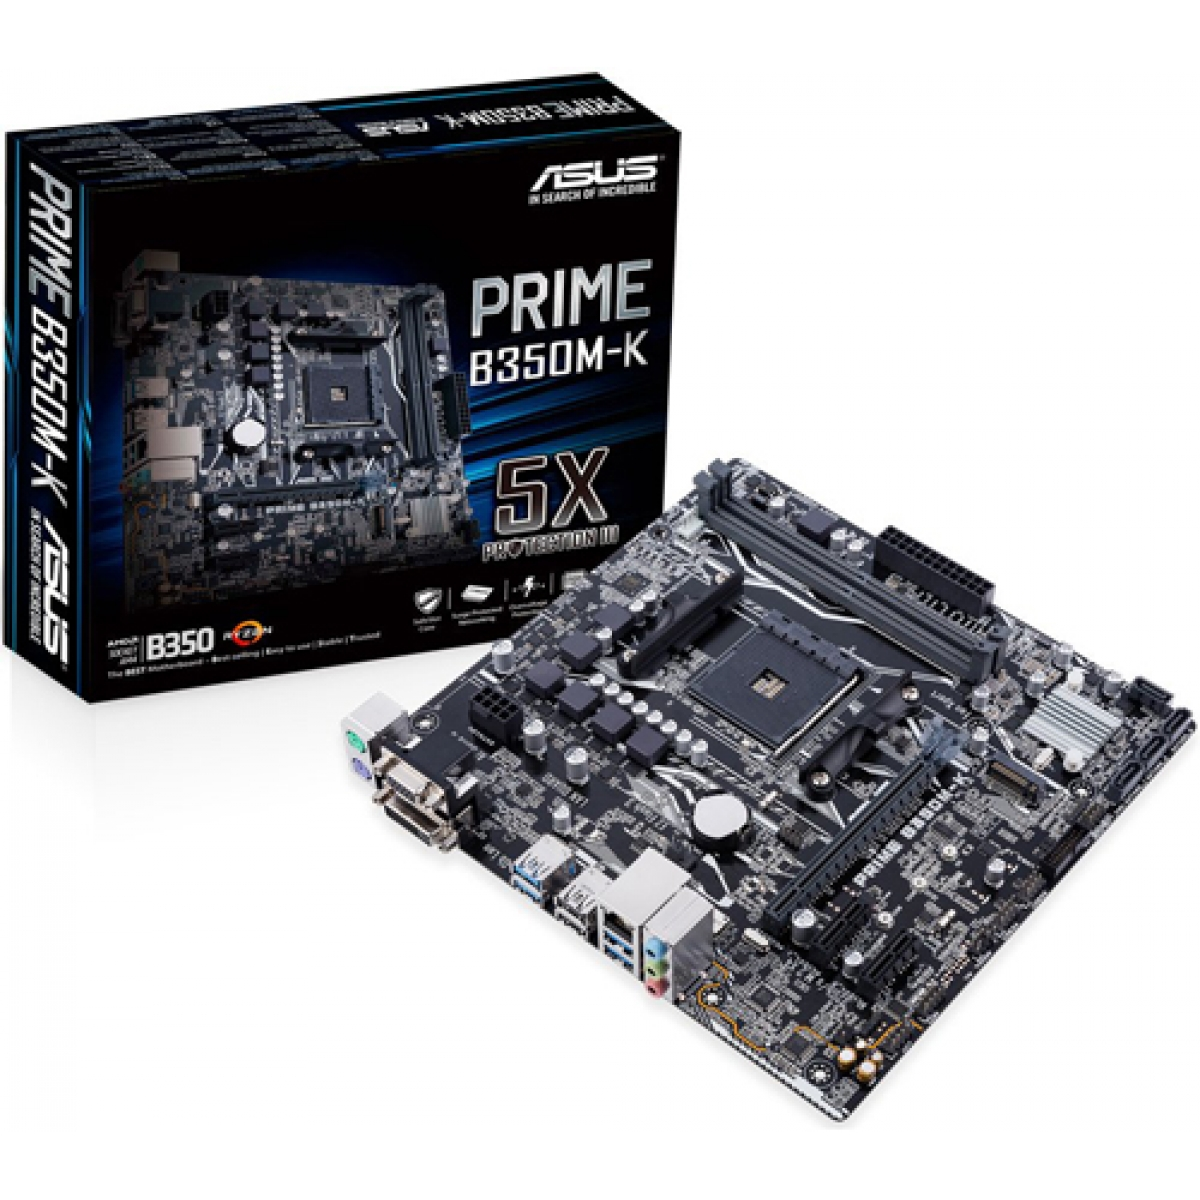 Placa Mãe Asus Prime B350M-K, Chipset B350, AMD AM4, mATX, DDR4